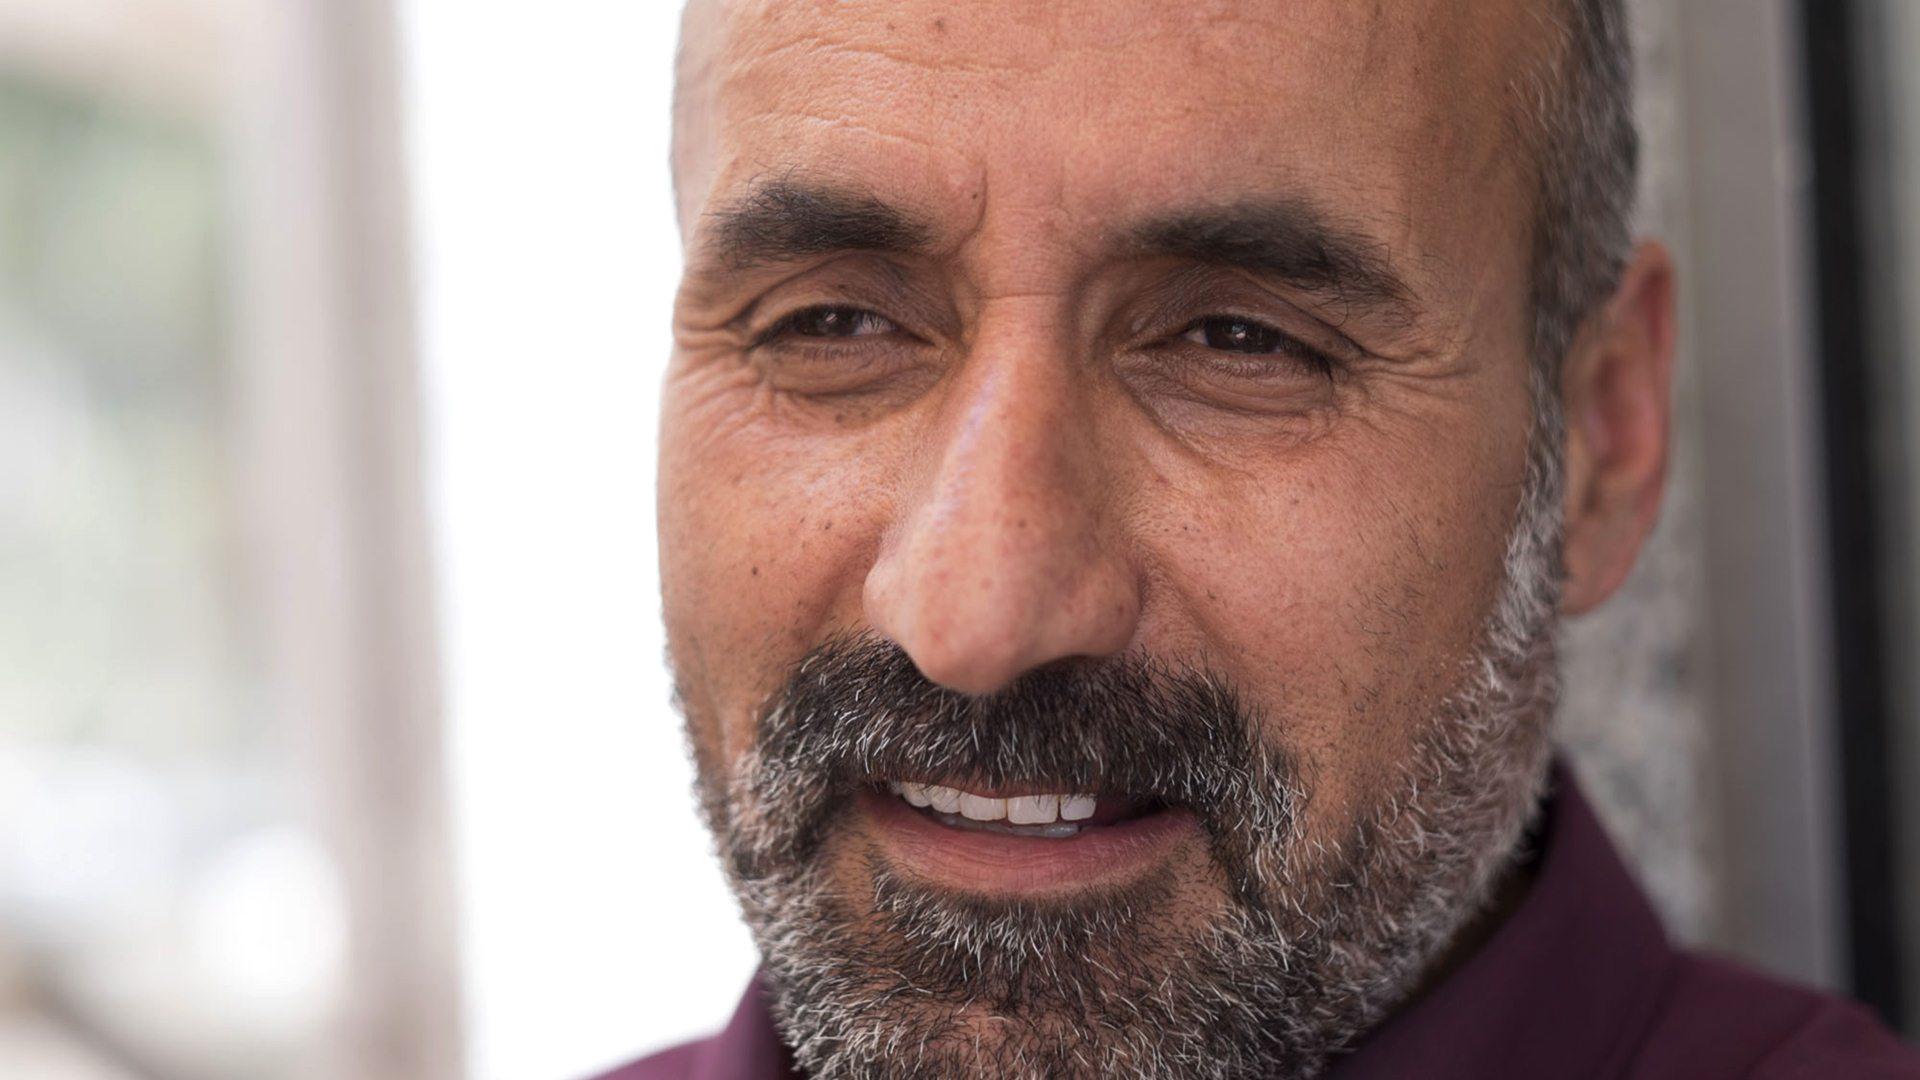 Portrait-IVD-Ali-Mabouaj-Interrogatoire-1-inkyfada